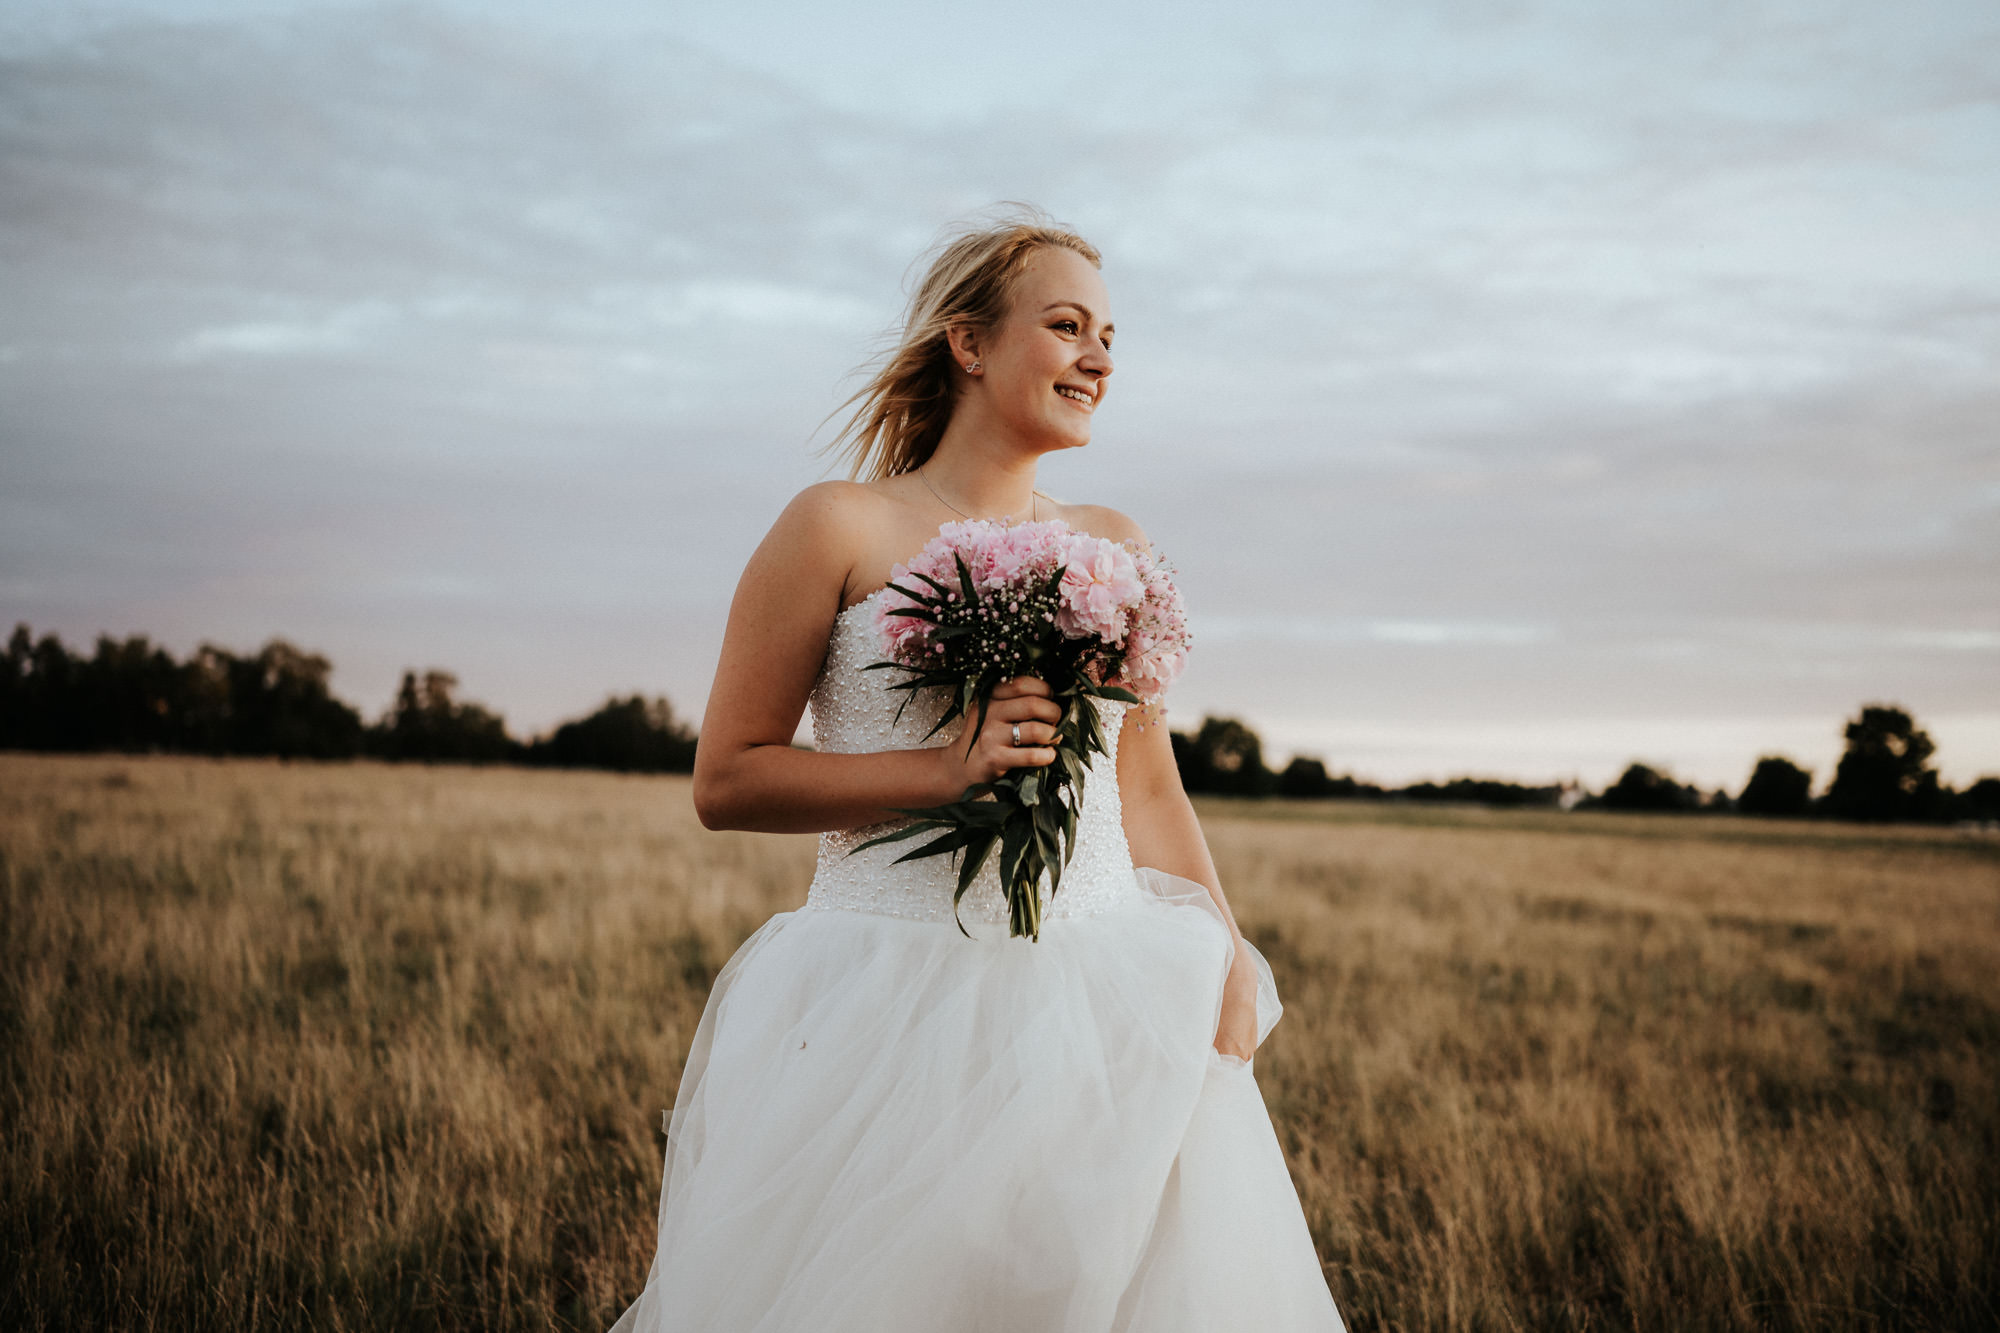 waltsmedia-hochzeitsreportage-after-wedding-shooting-berlin-21